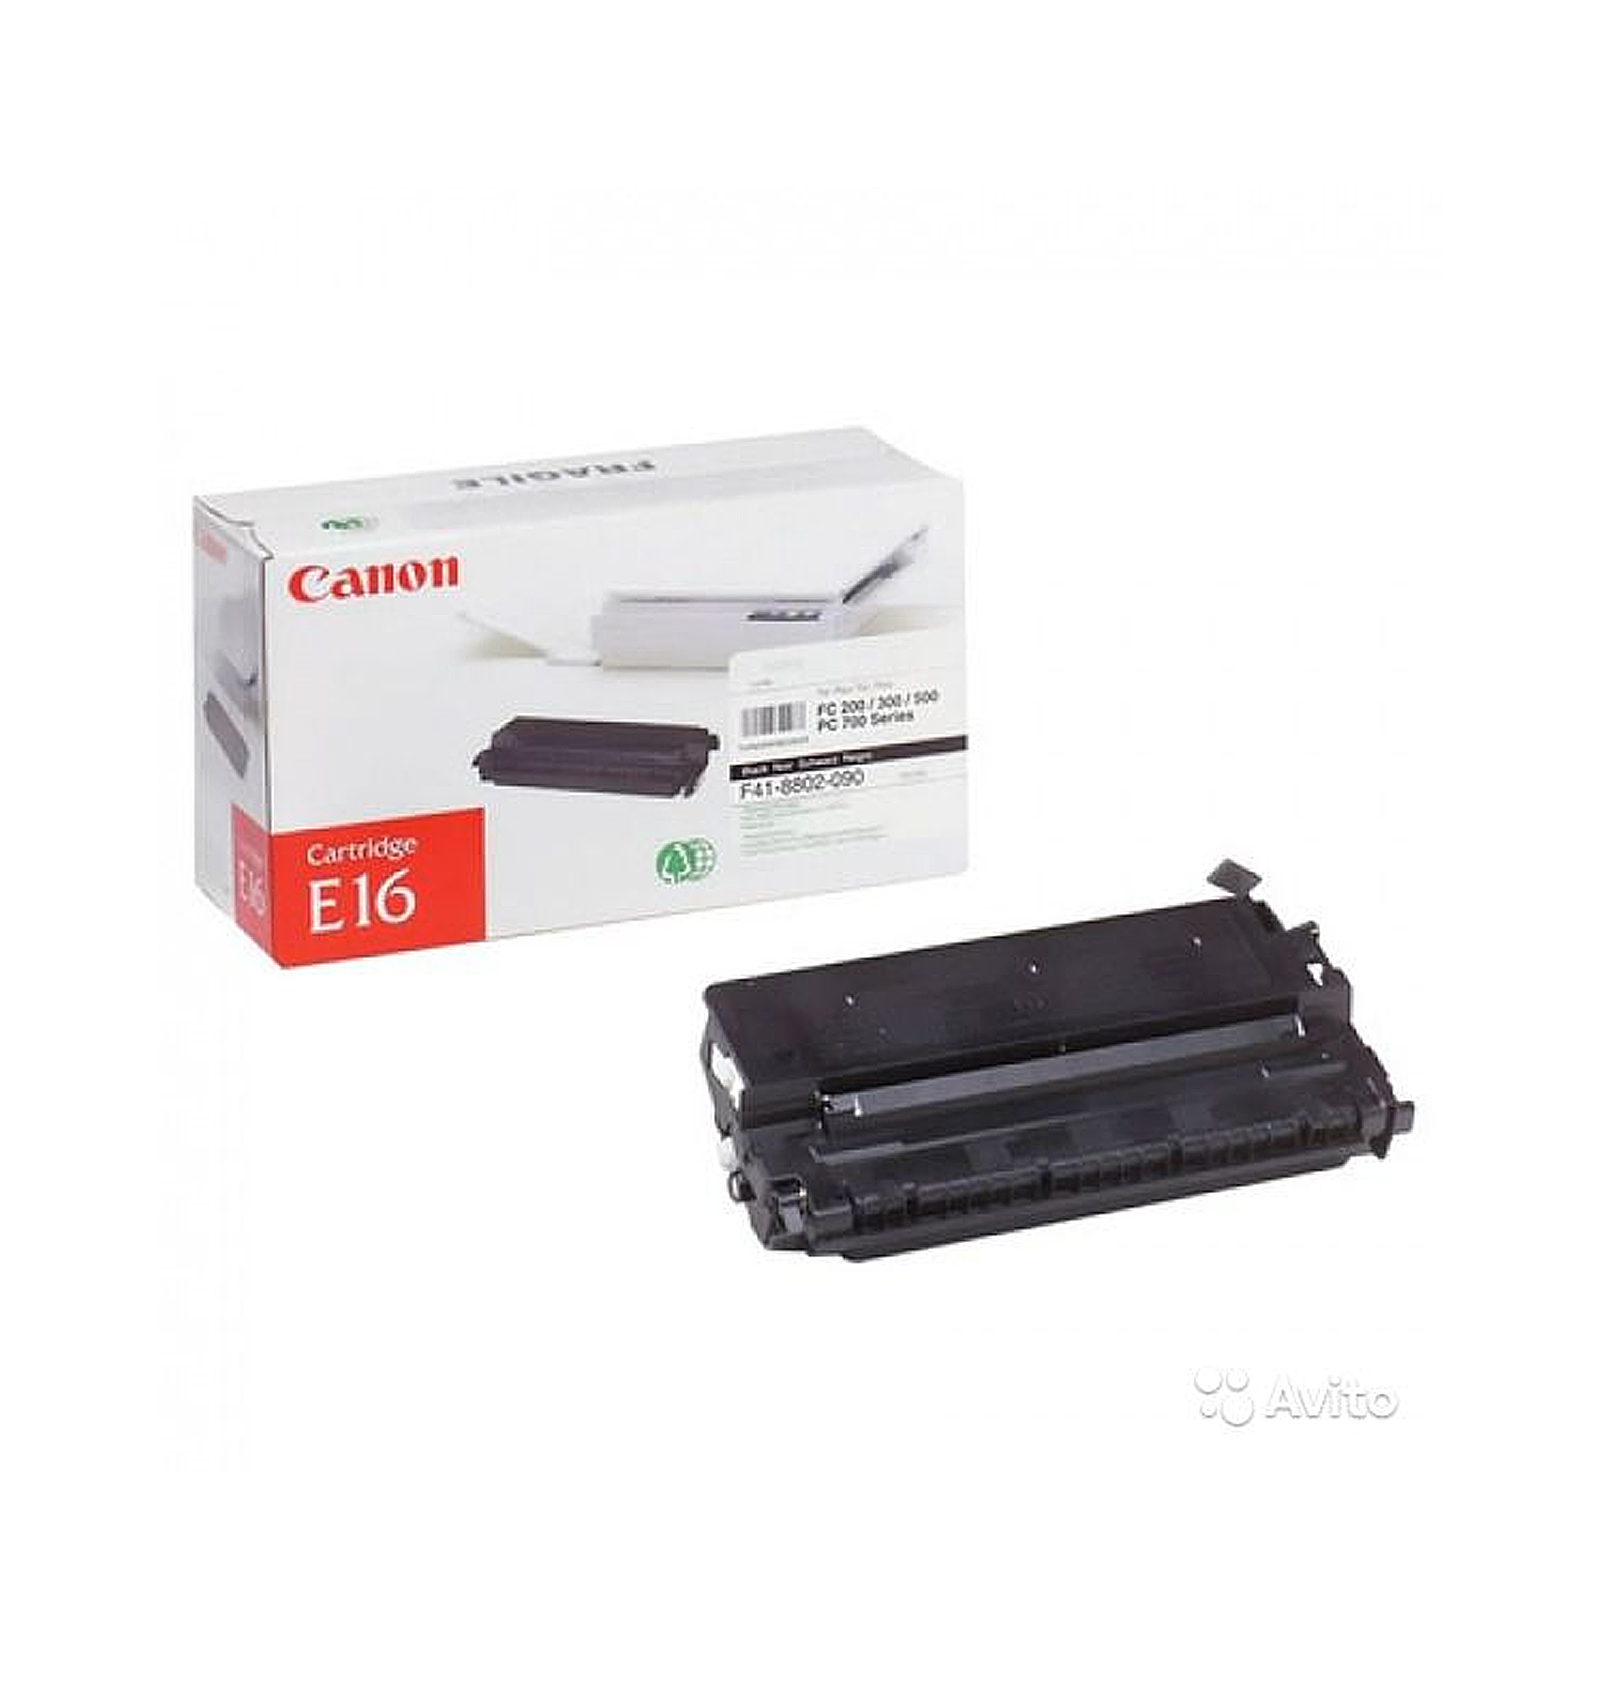 Canon E-16 для FC-2xx/3xx/530/108/208/PC-7xx/PC-8xx